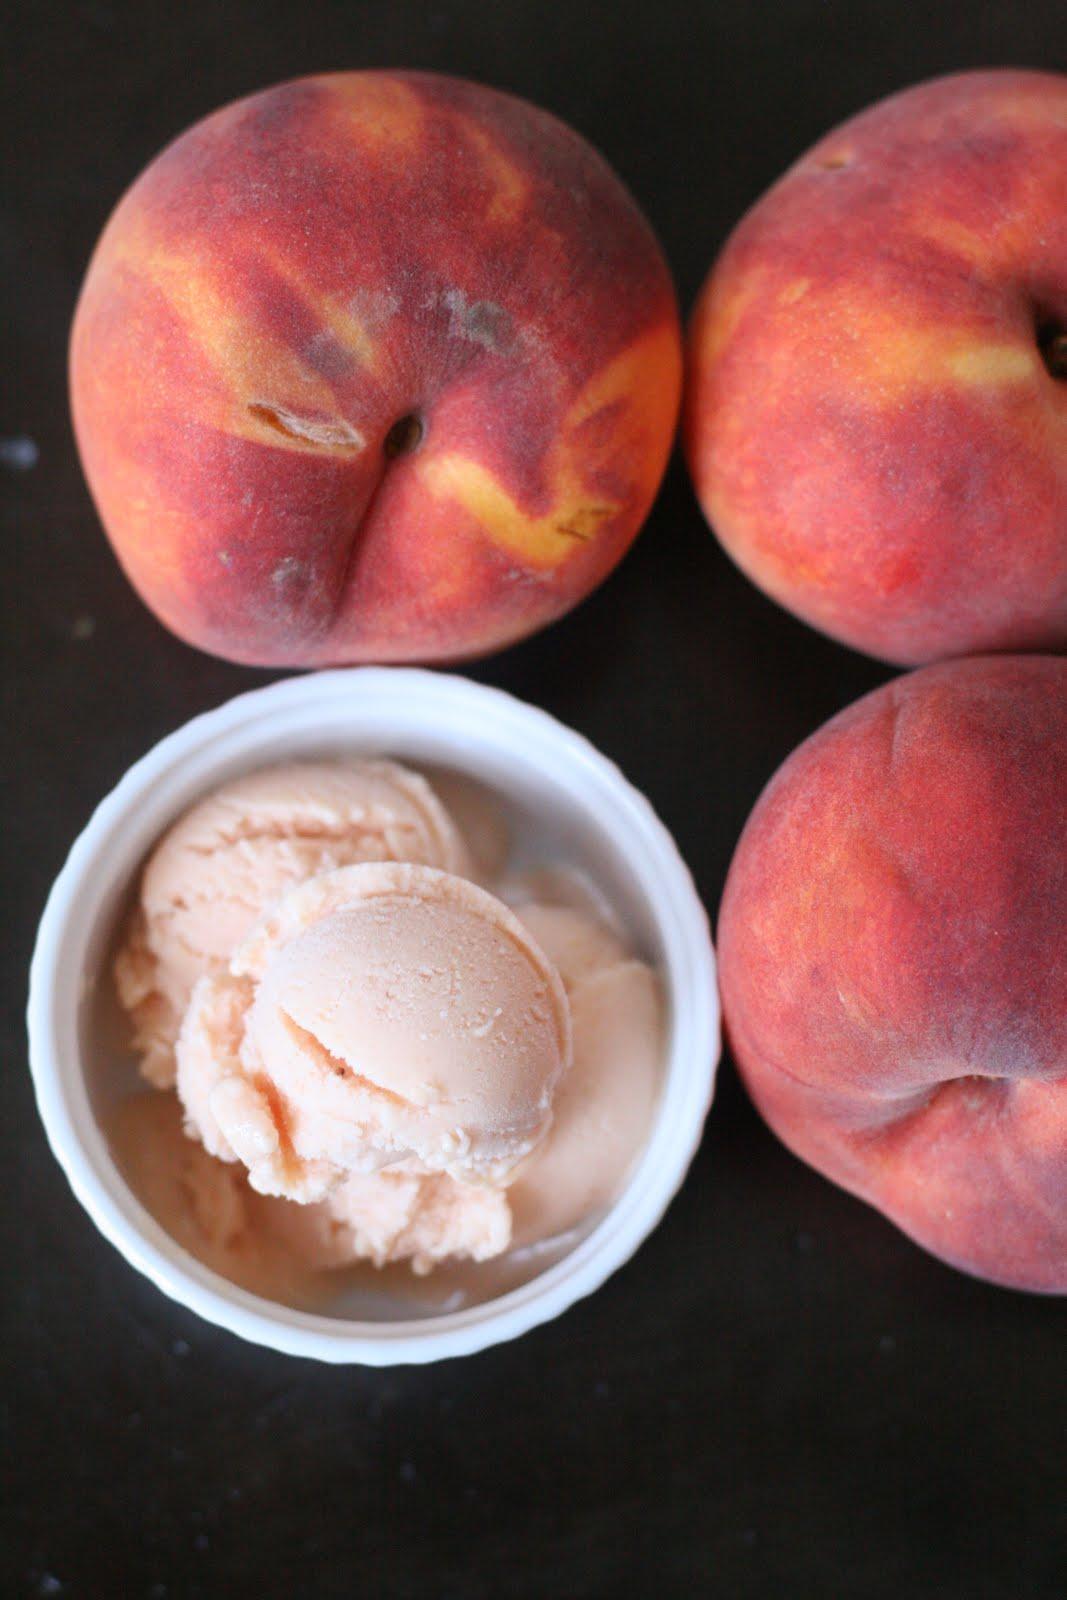 Honey Peach Frozen Yogurt: On getting involved | Week of Menus